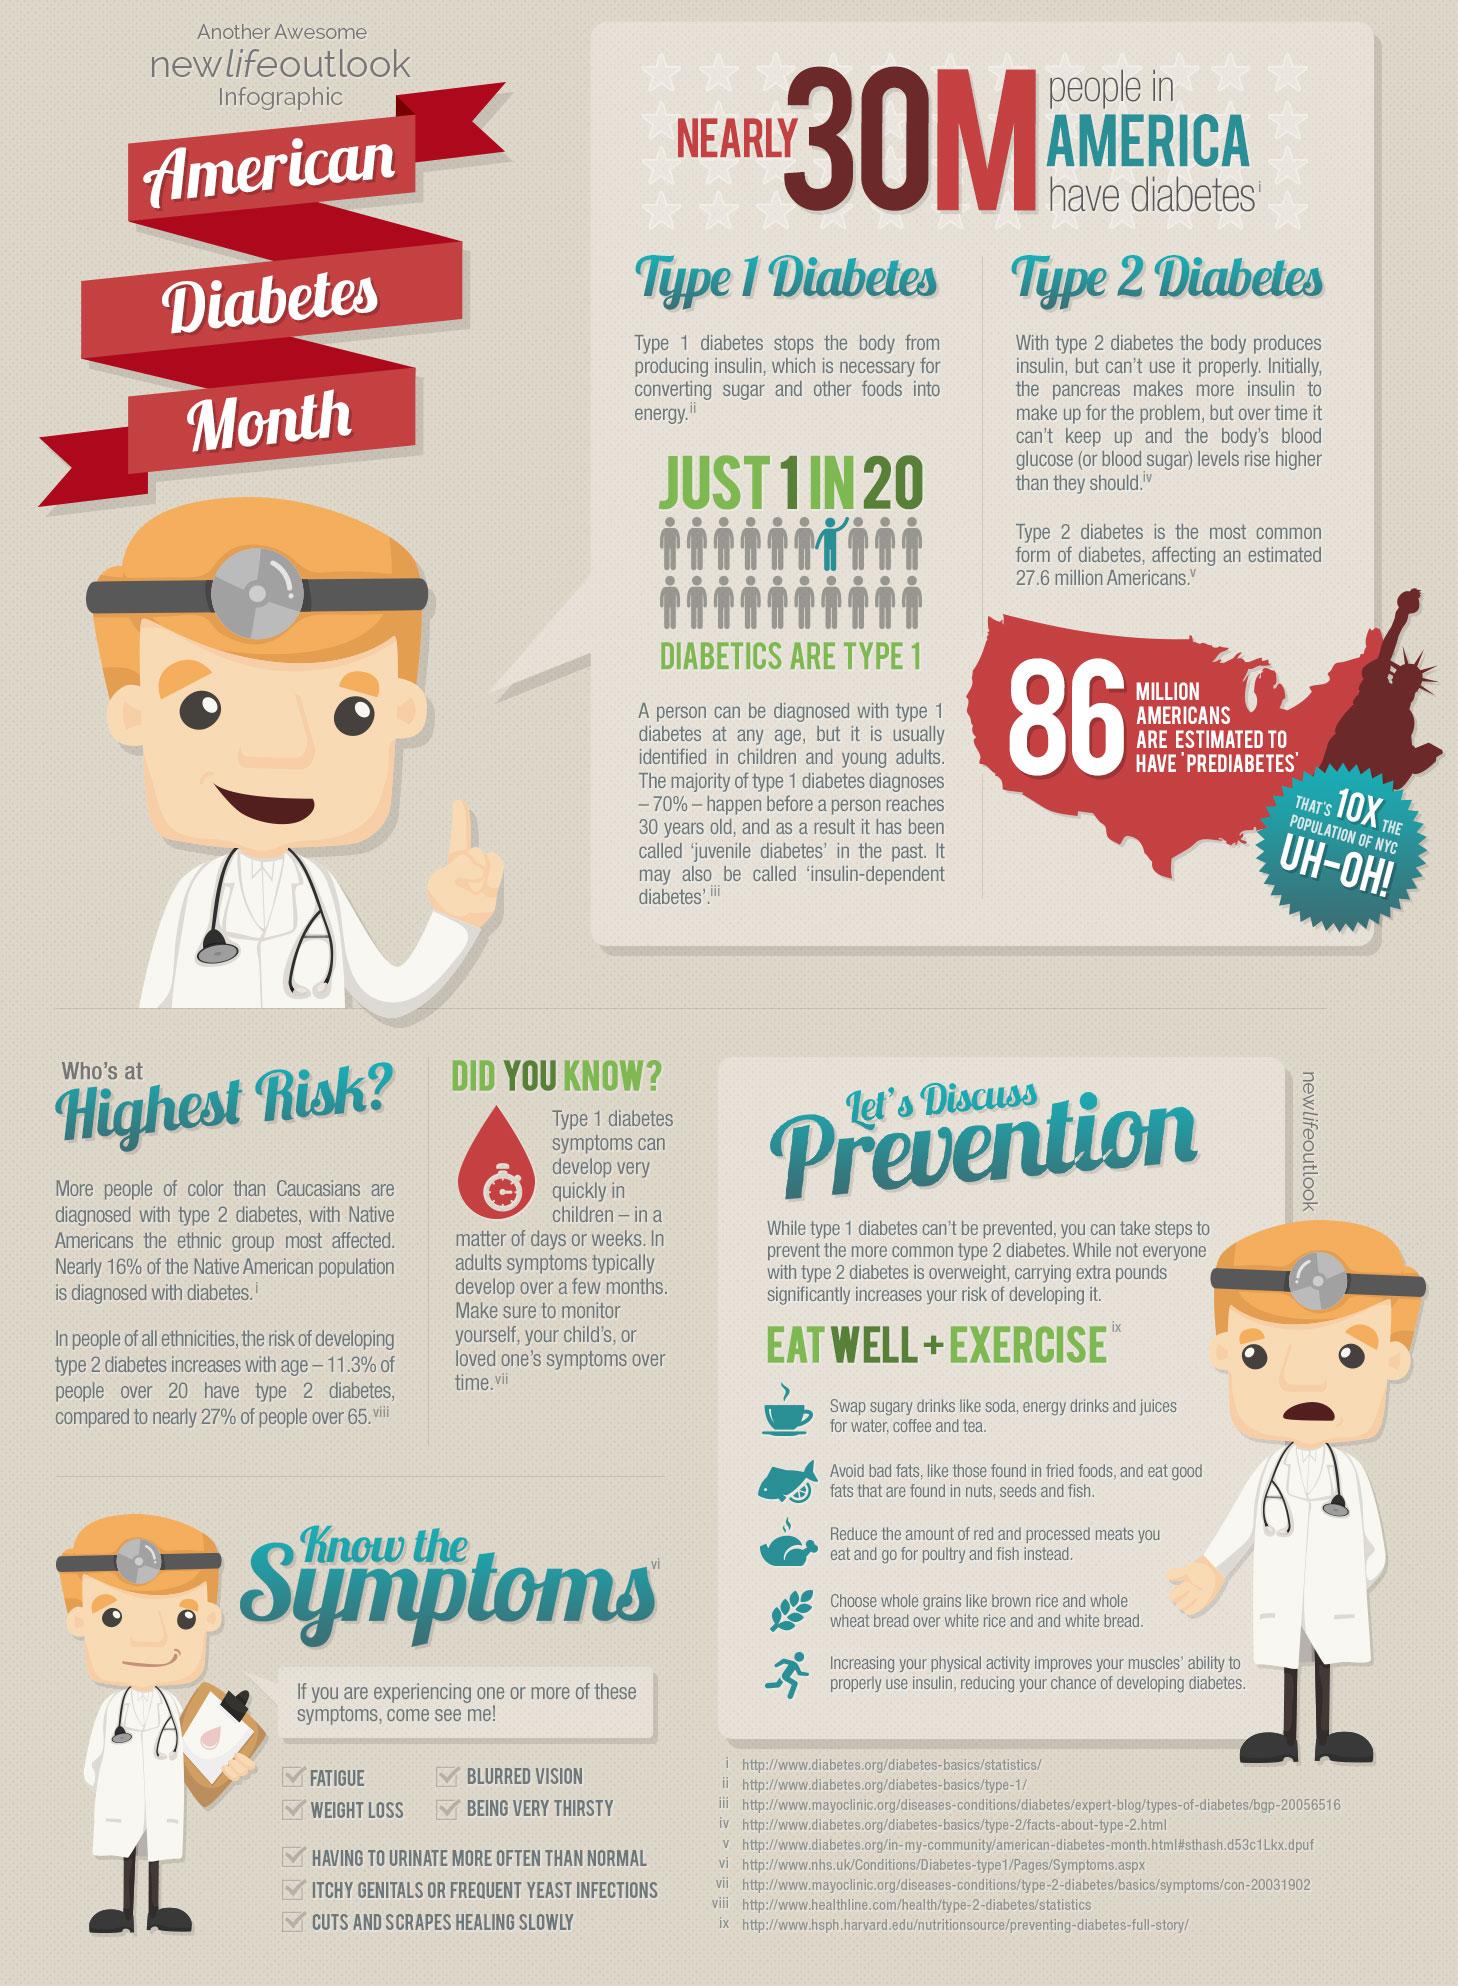 American Diabetes Month - Raising Type 1 Diabetes Awareness